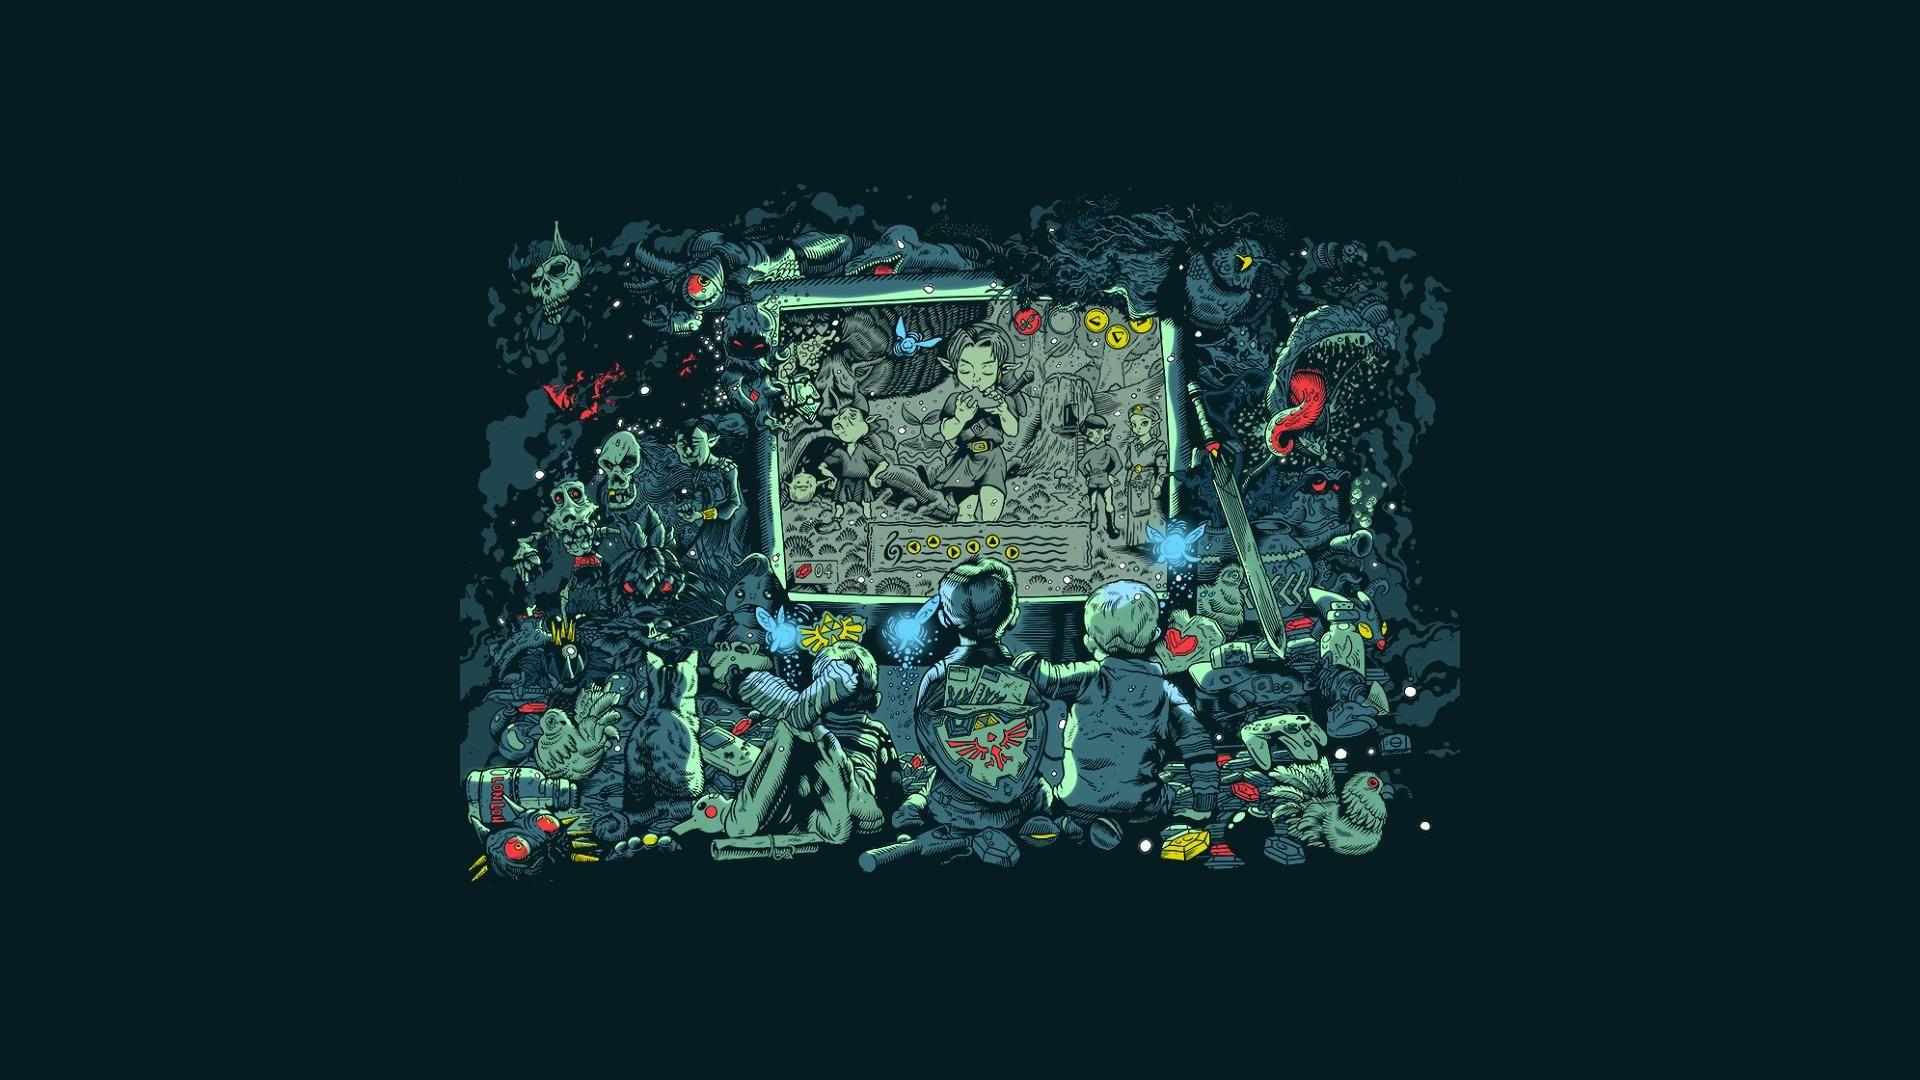 Zelda illustration by Tim McDonaghill 4k wallpaper for